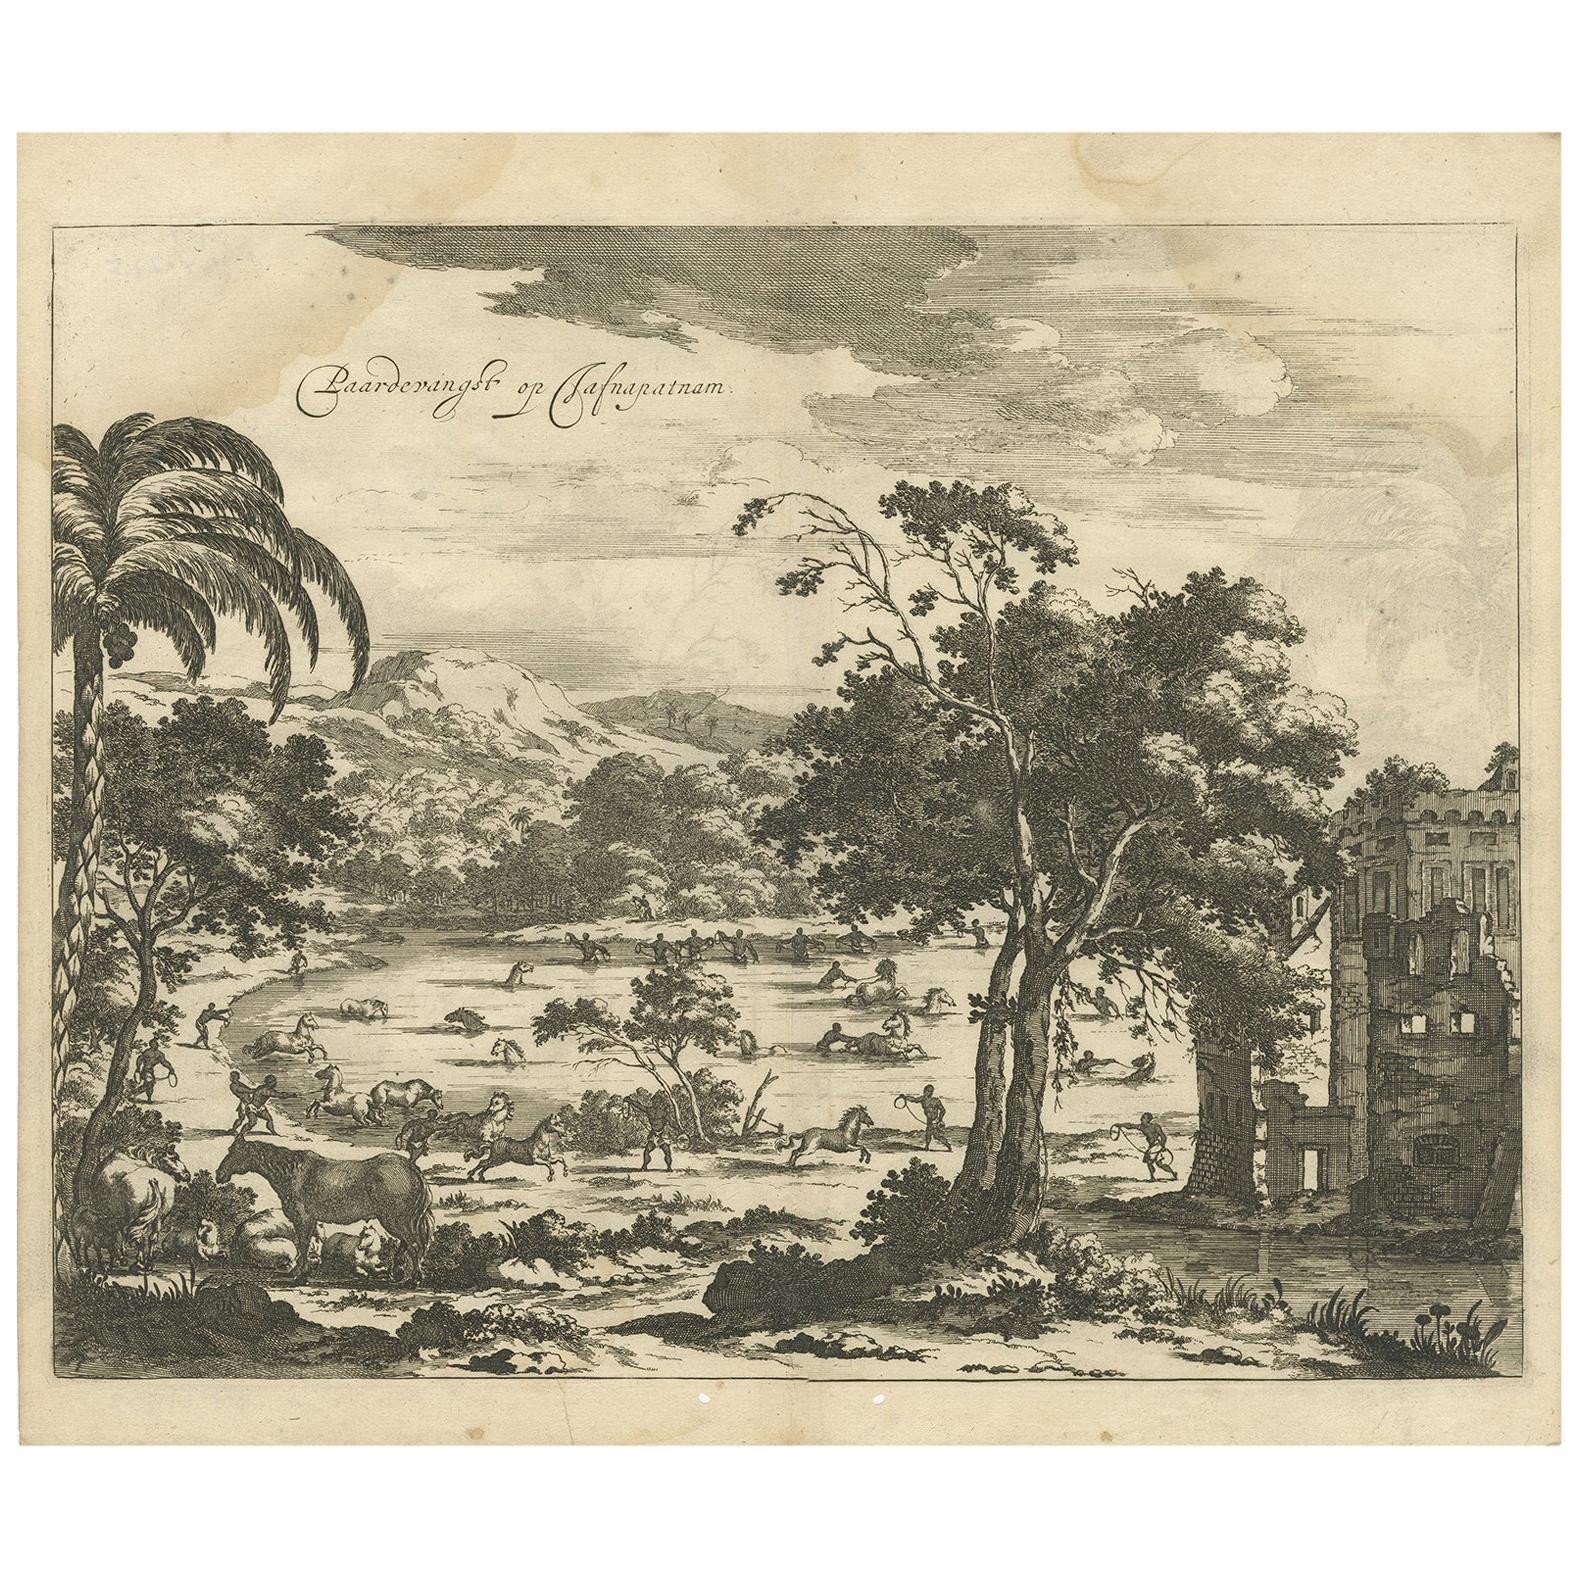 Antique Print of Horse Catching in Ceylon/Sri Lanka by P. Baldaeus (1672)